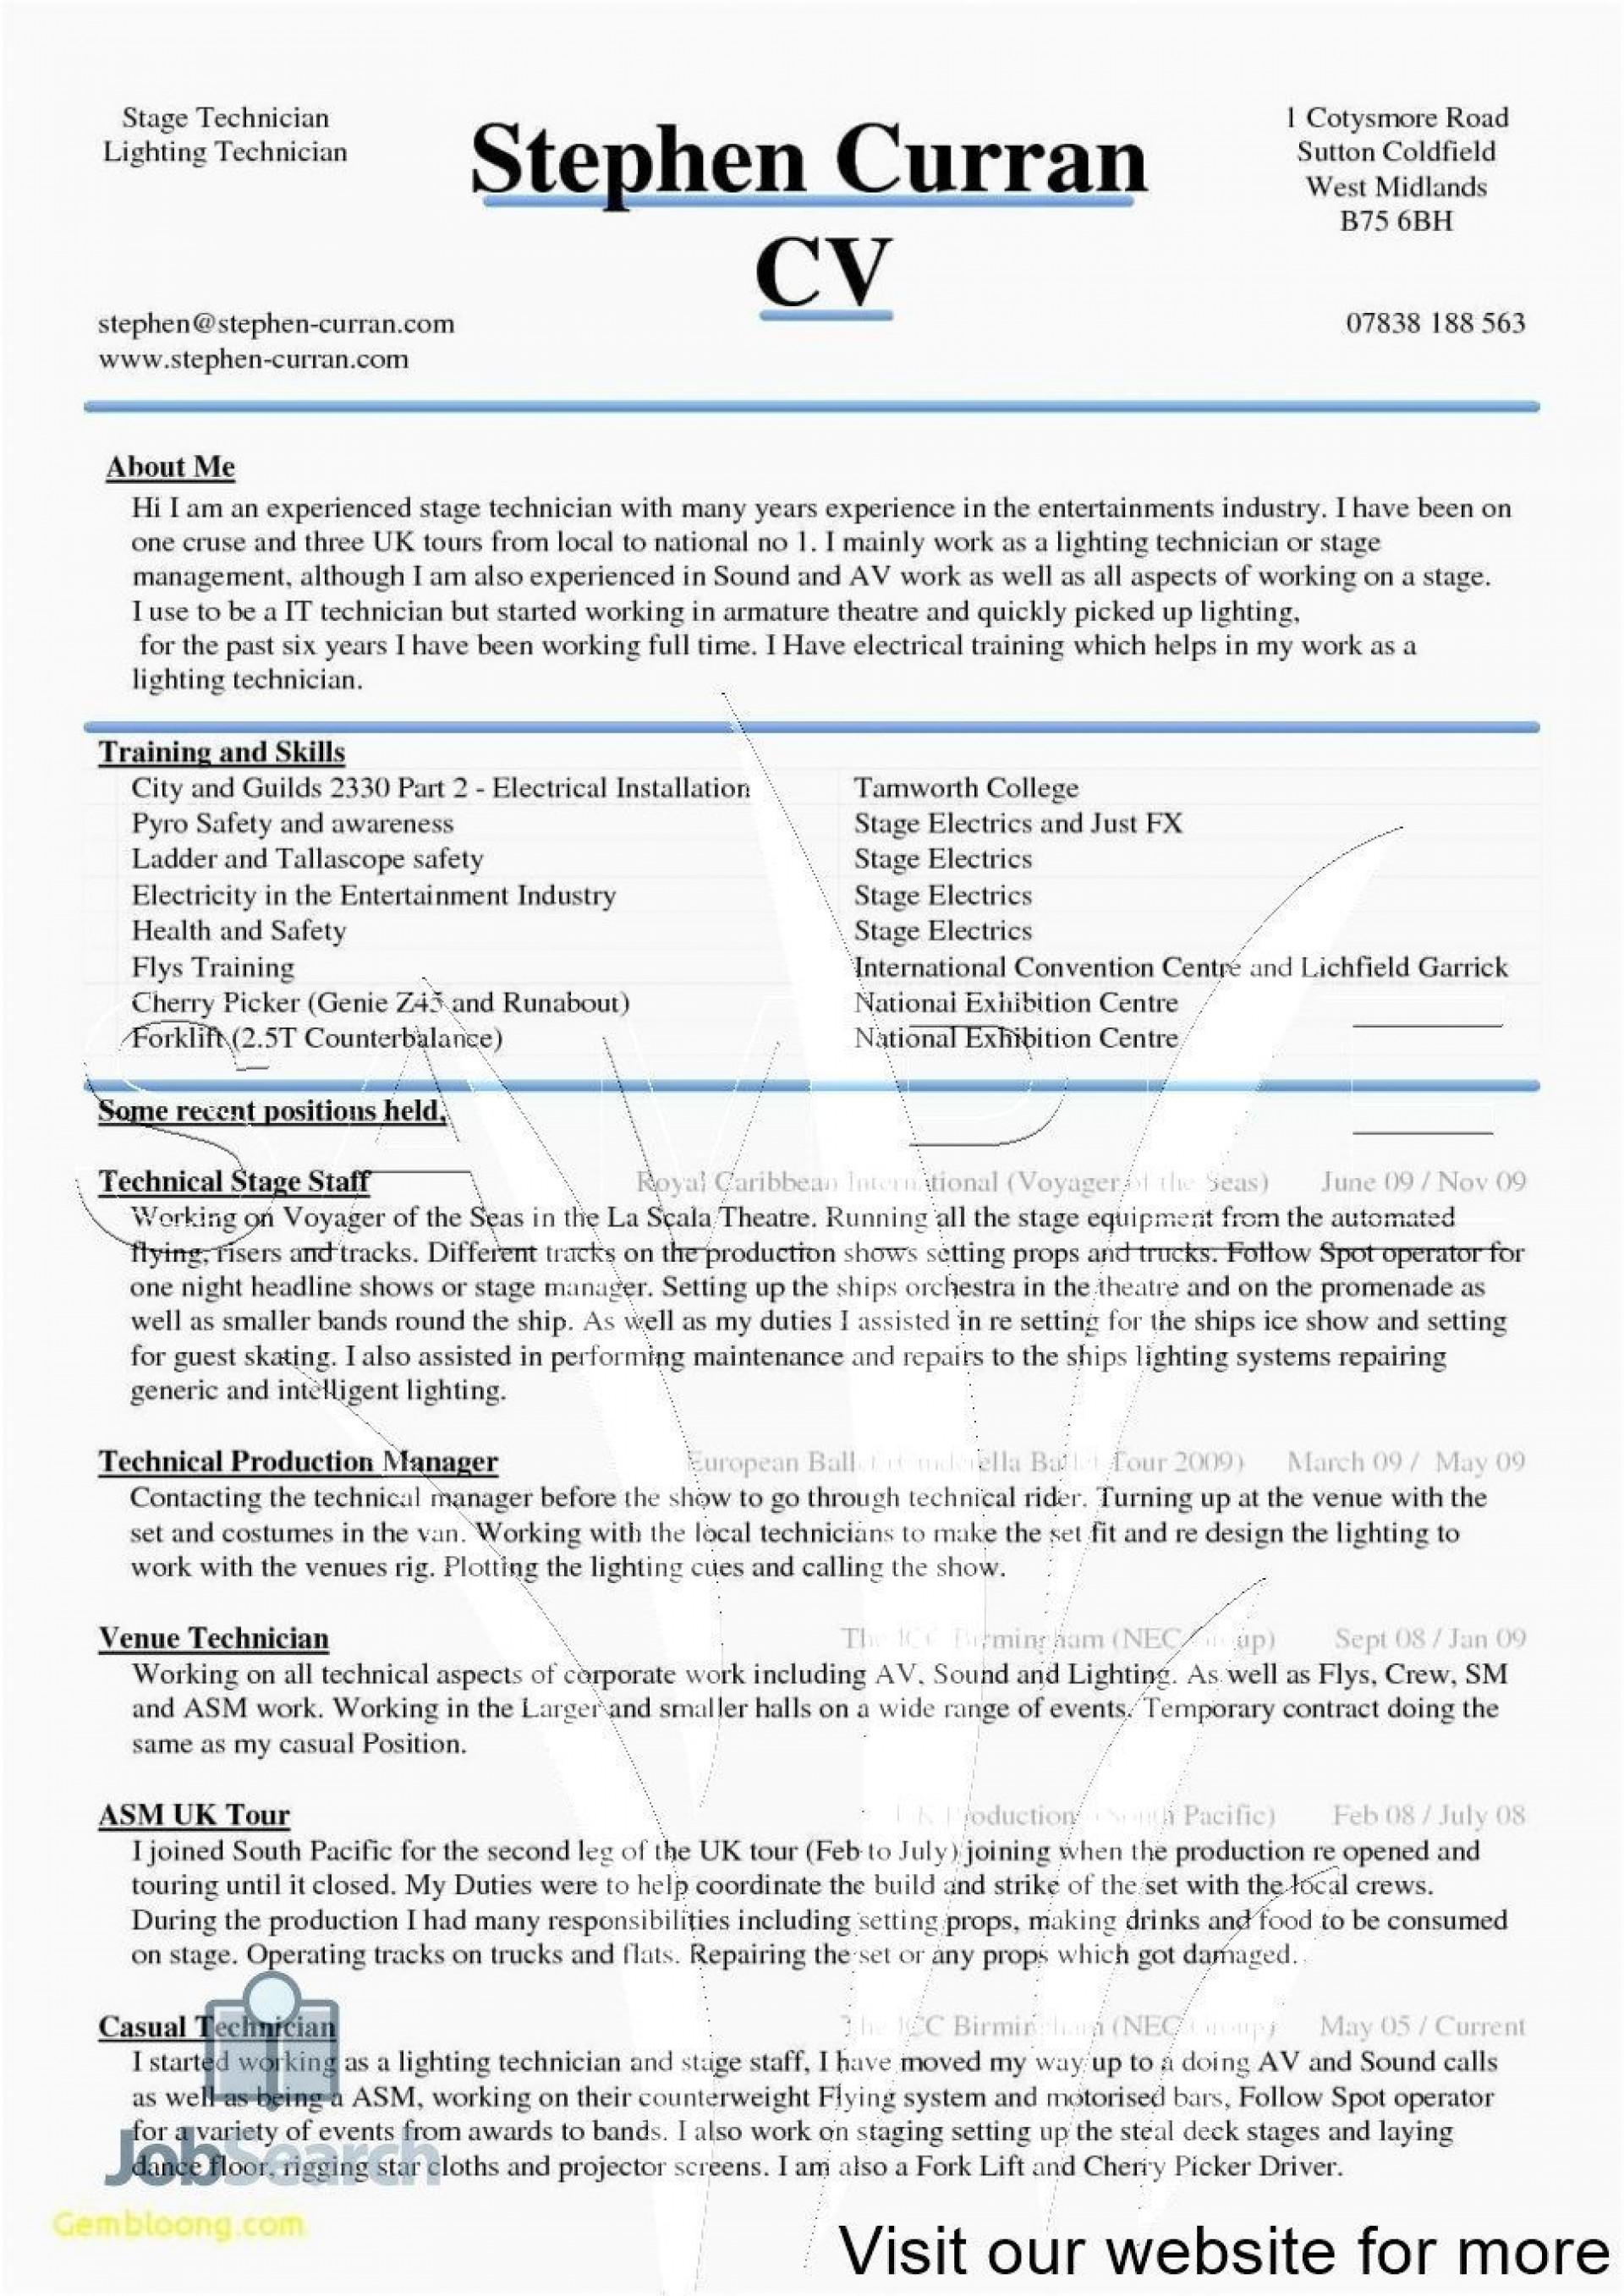 002 Wondrou Professional Cv Template Free Word Example  Uk Best Resume Download1920